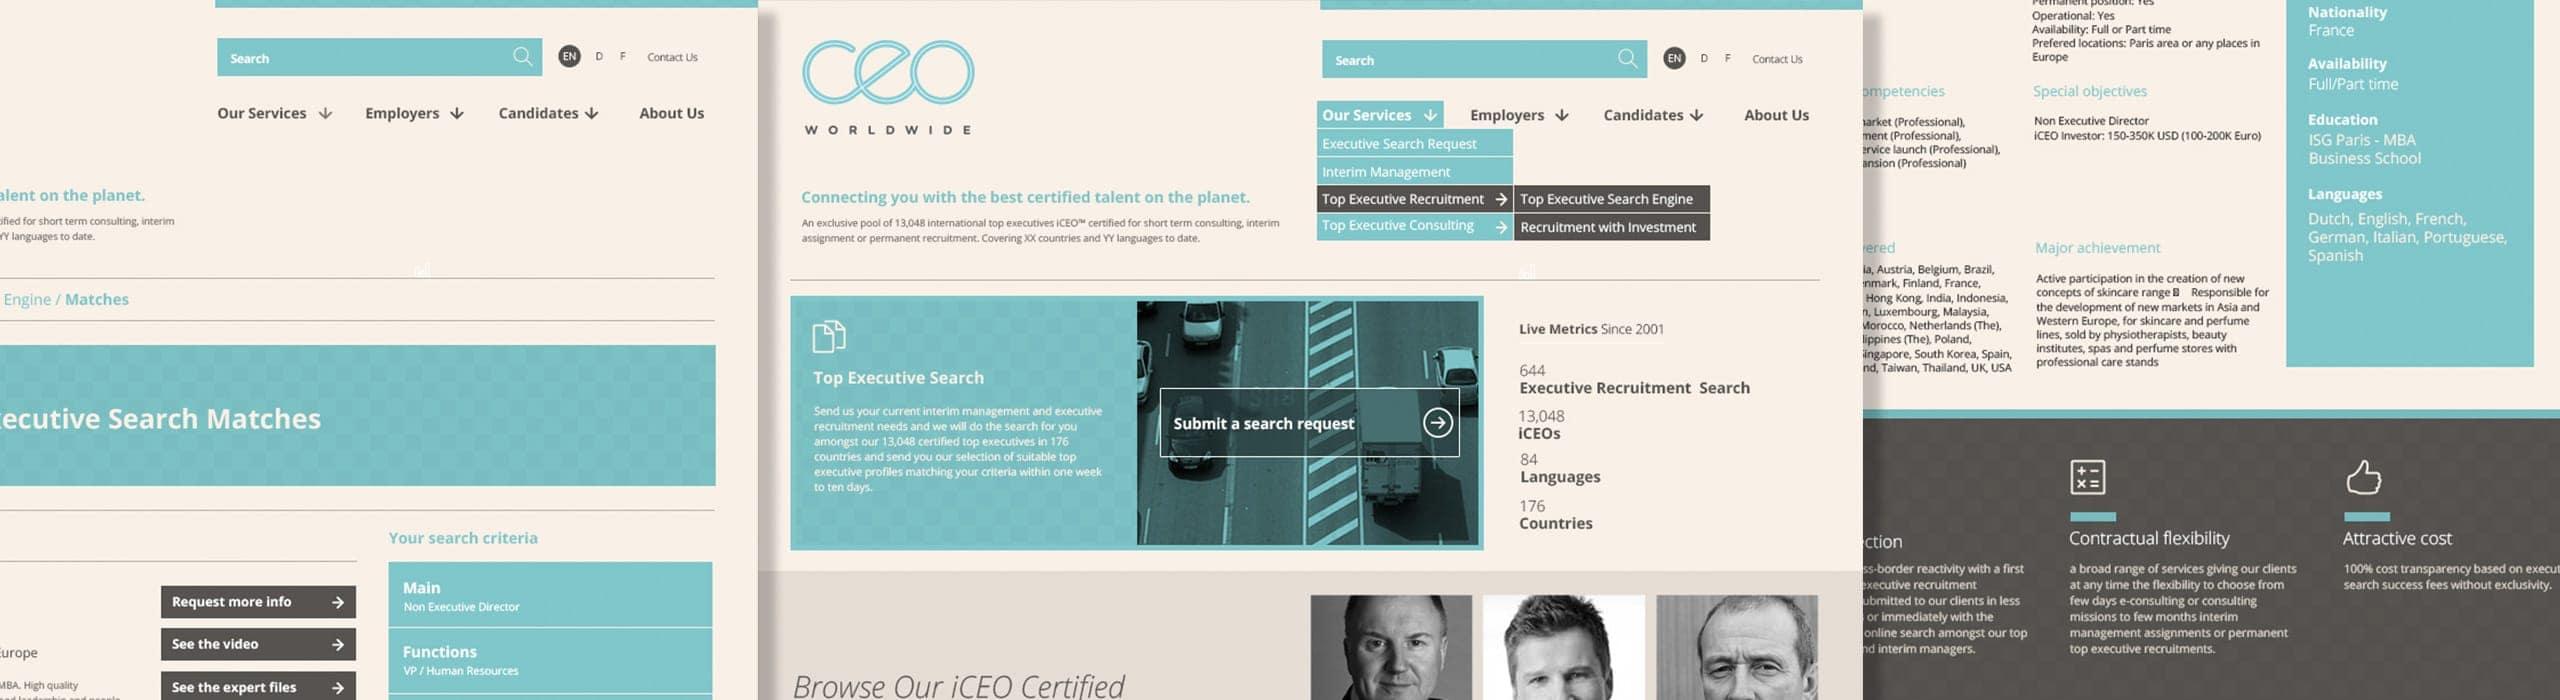 CEO Worldwide - natie-ceo-worldwide-website-pages - Natie Branding Agency